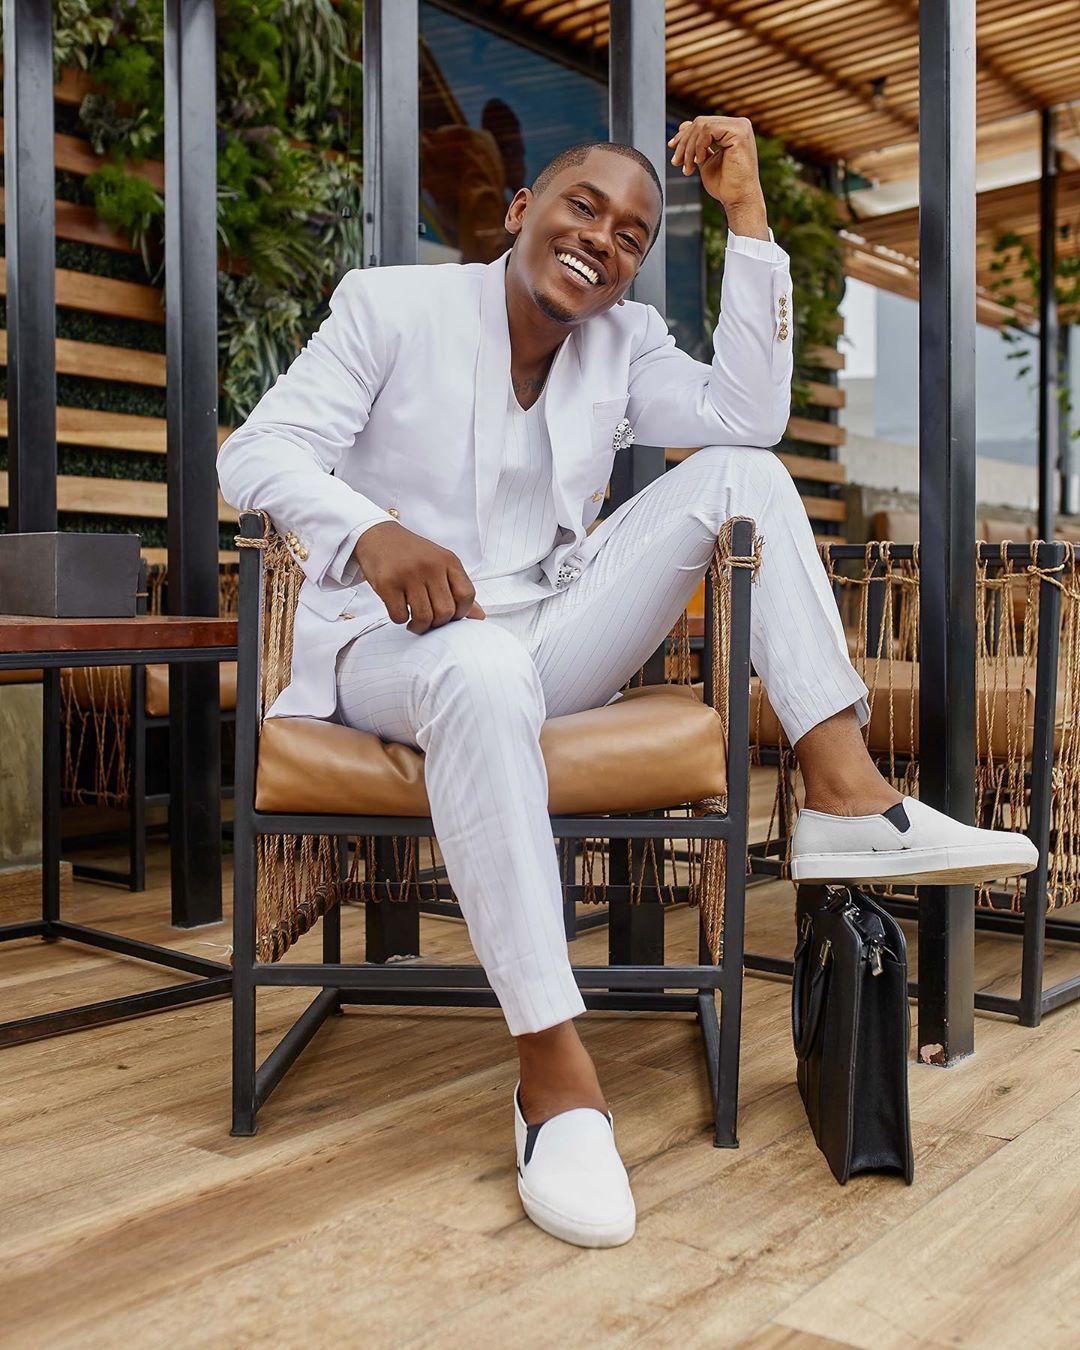 Men-style-fashion-white-suit-style-rave